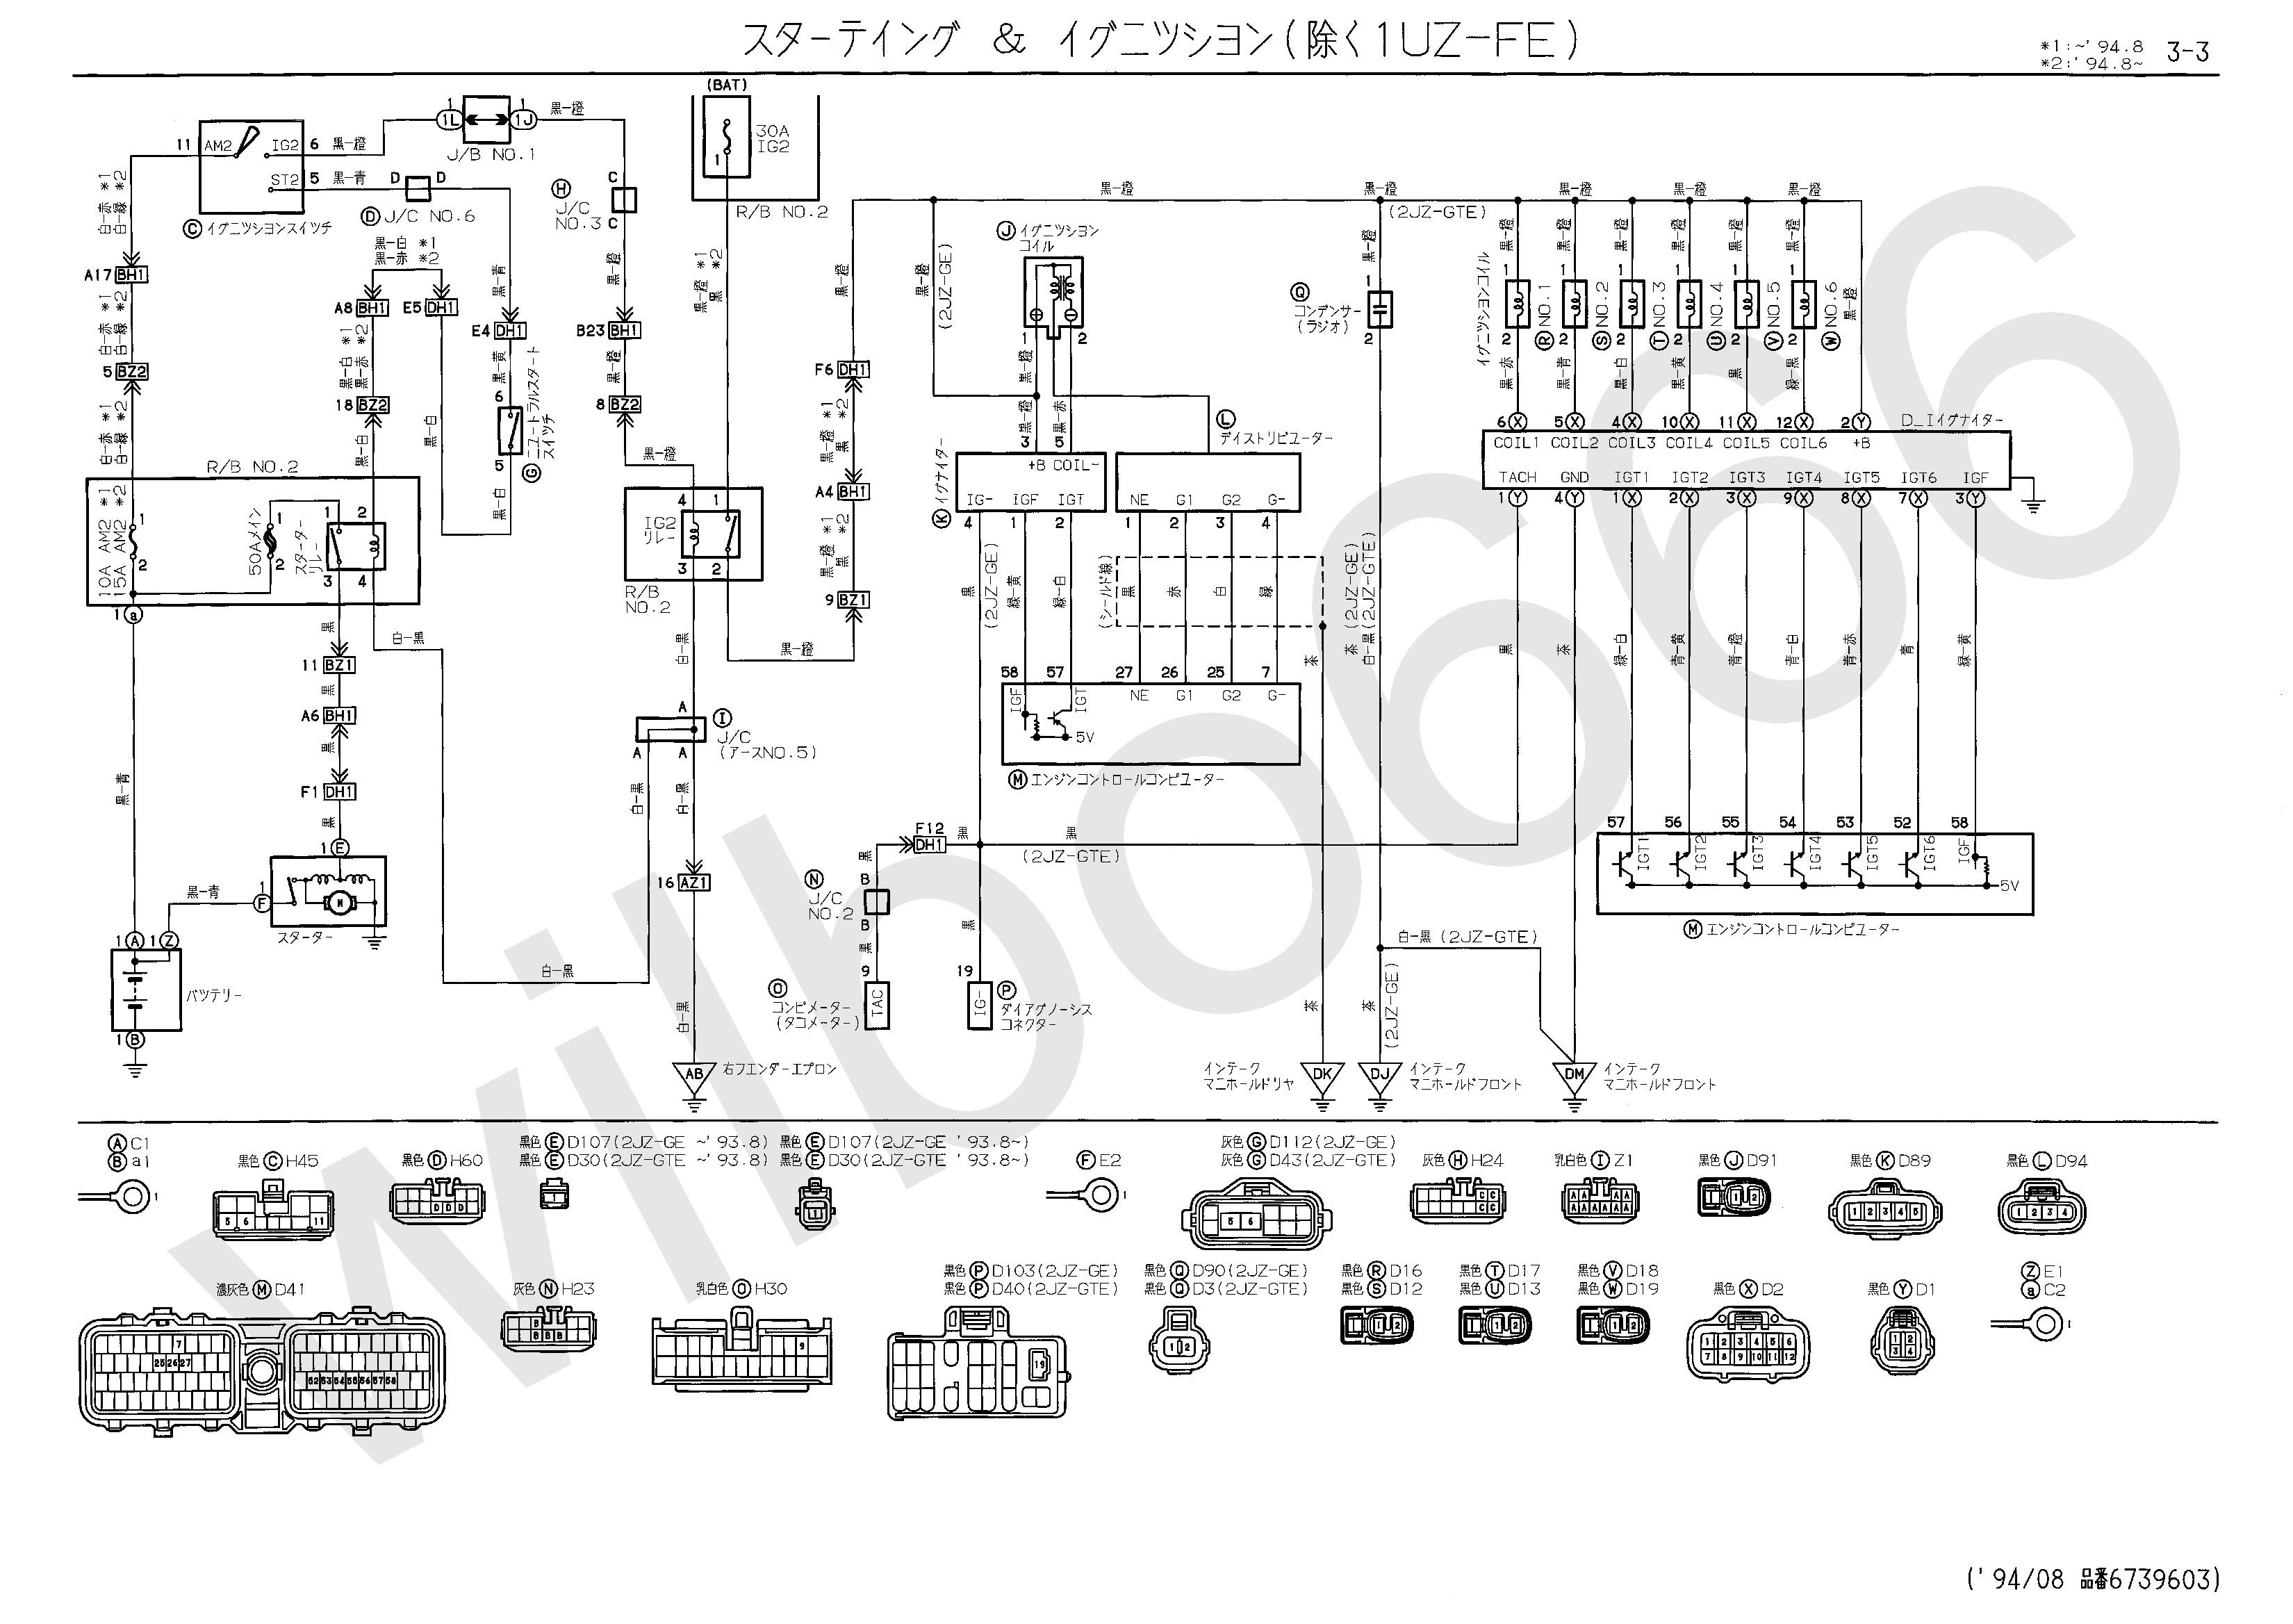 2009 kenworth w900 headlight wiring diagram sr 1609  1990 peterbilt 379 headlight wiring diagram schematic wiring  headlight wiring diagram schematic wiring